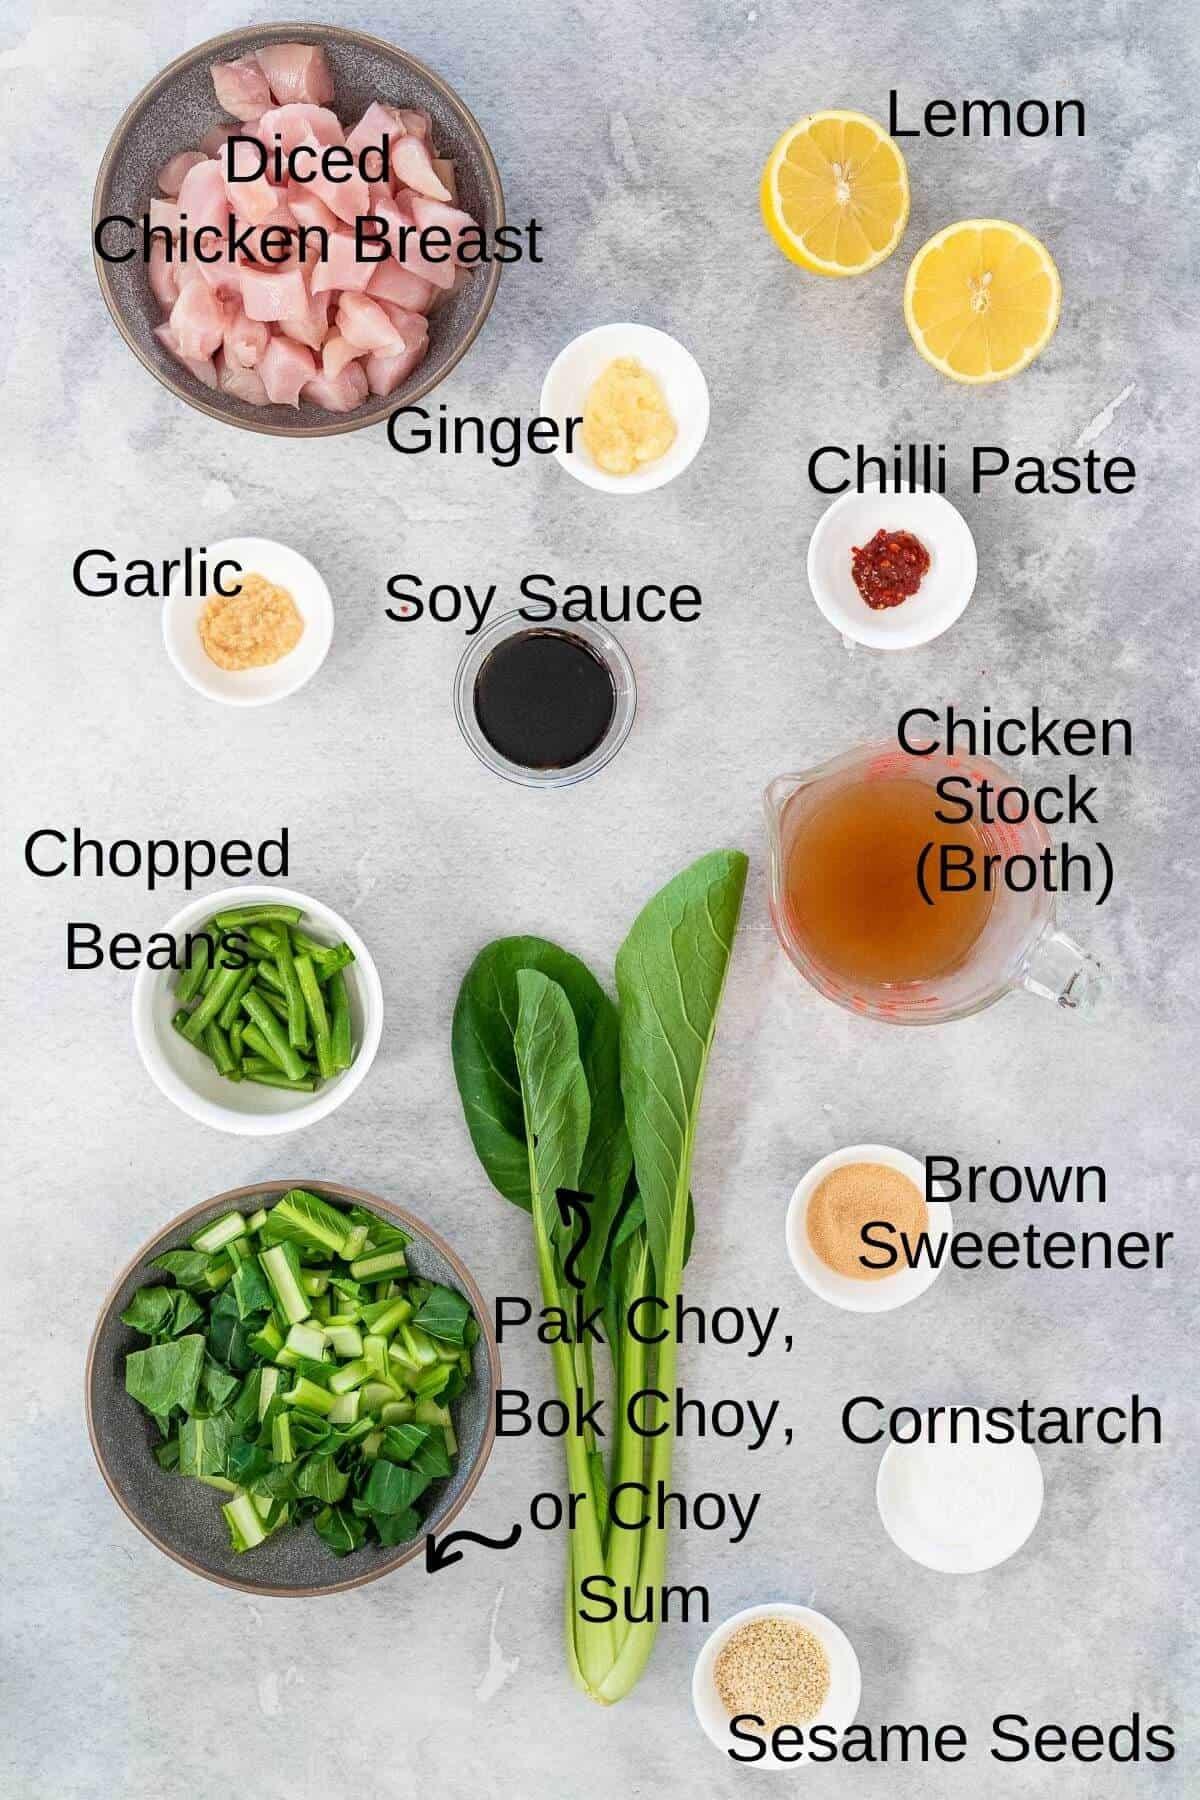 Lemon chicken stir fry ingredients